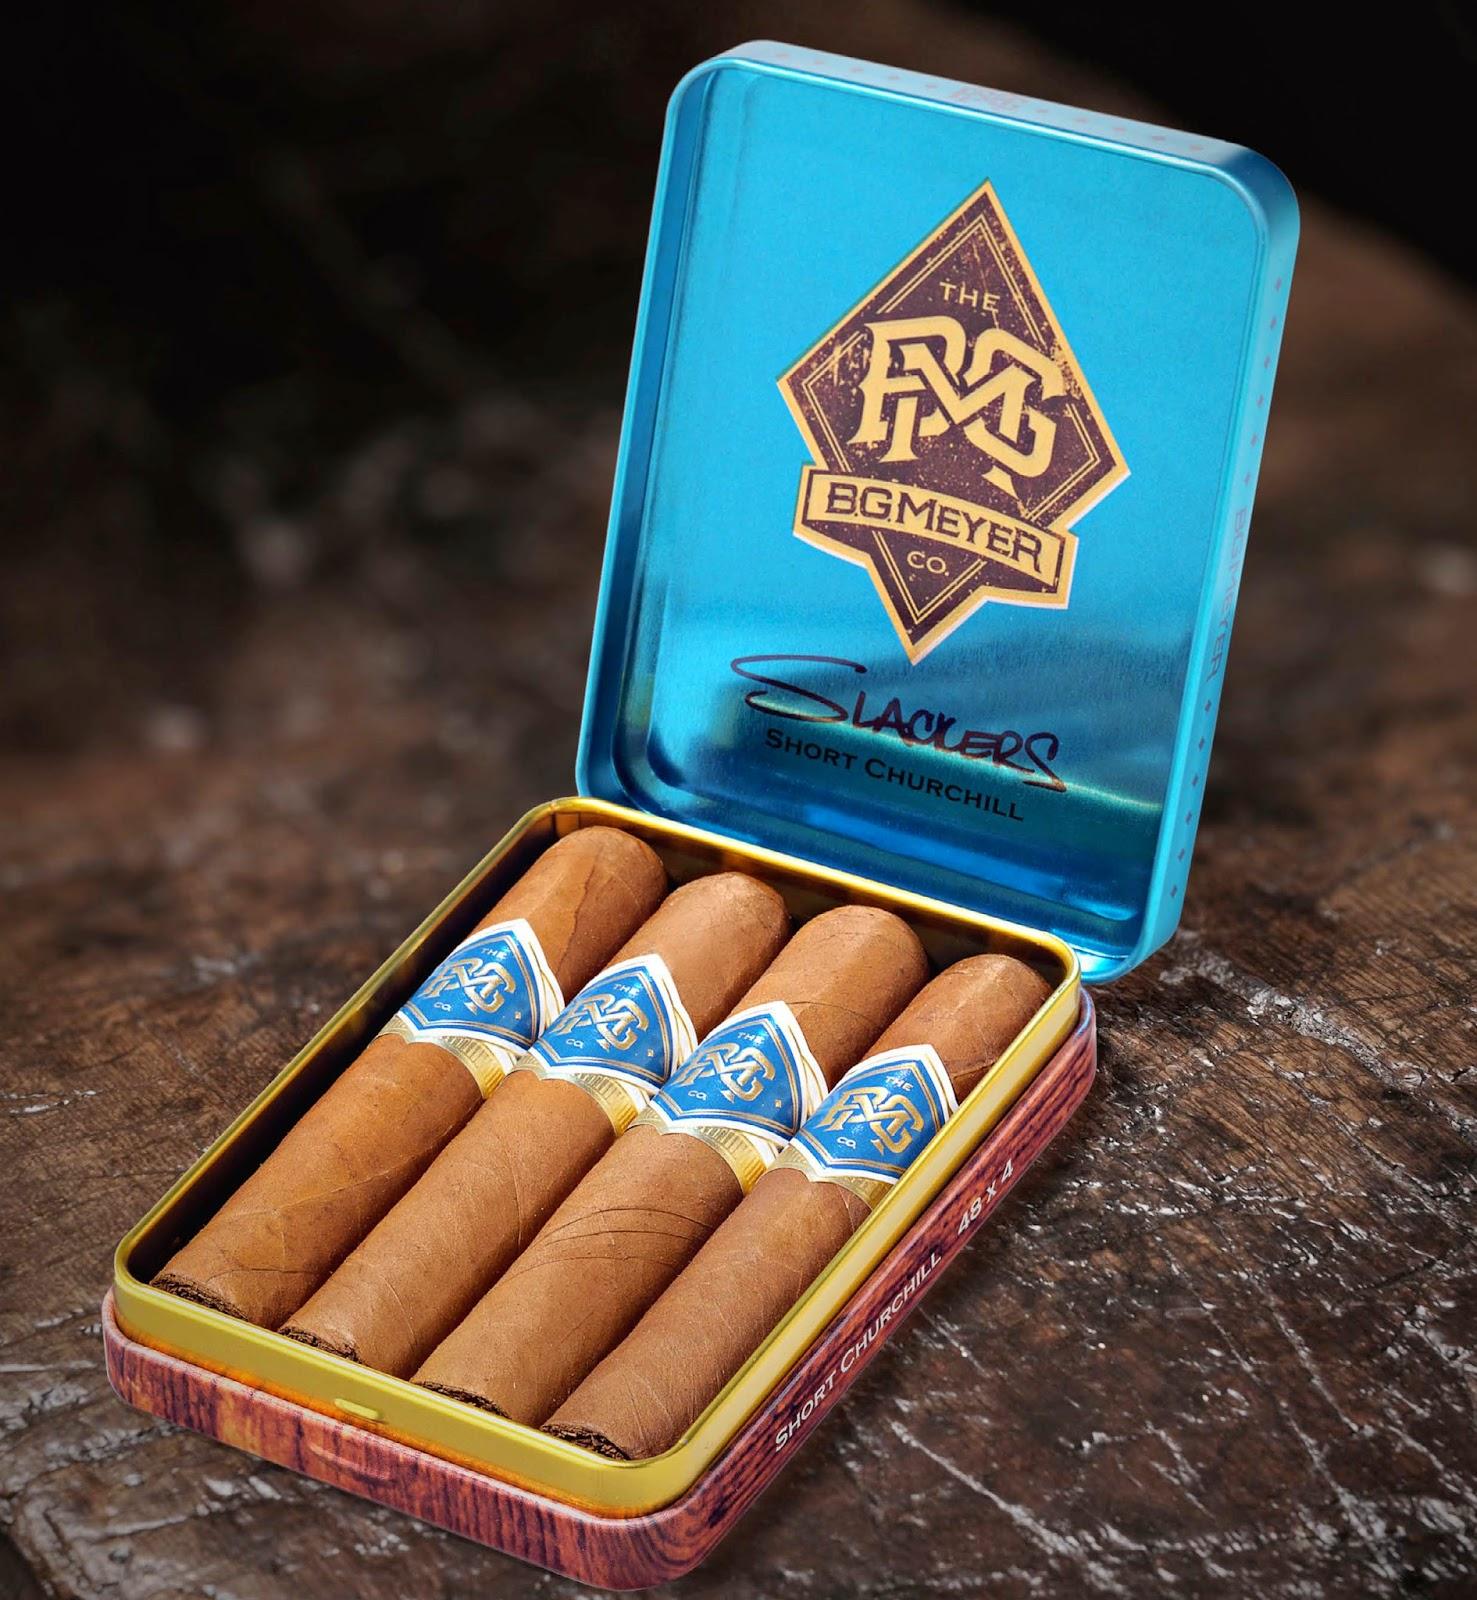 Cigar News: B.G. Meyer Slackers (Cigar Preview)